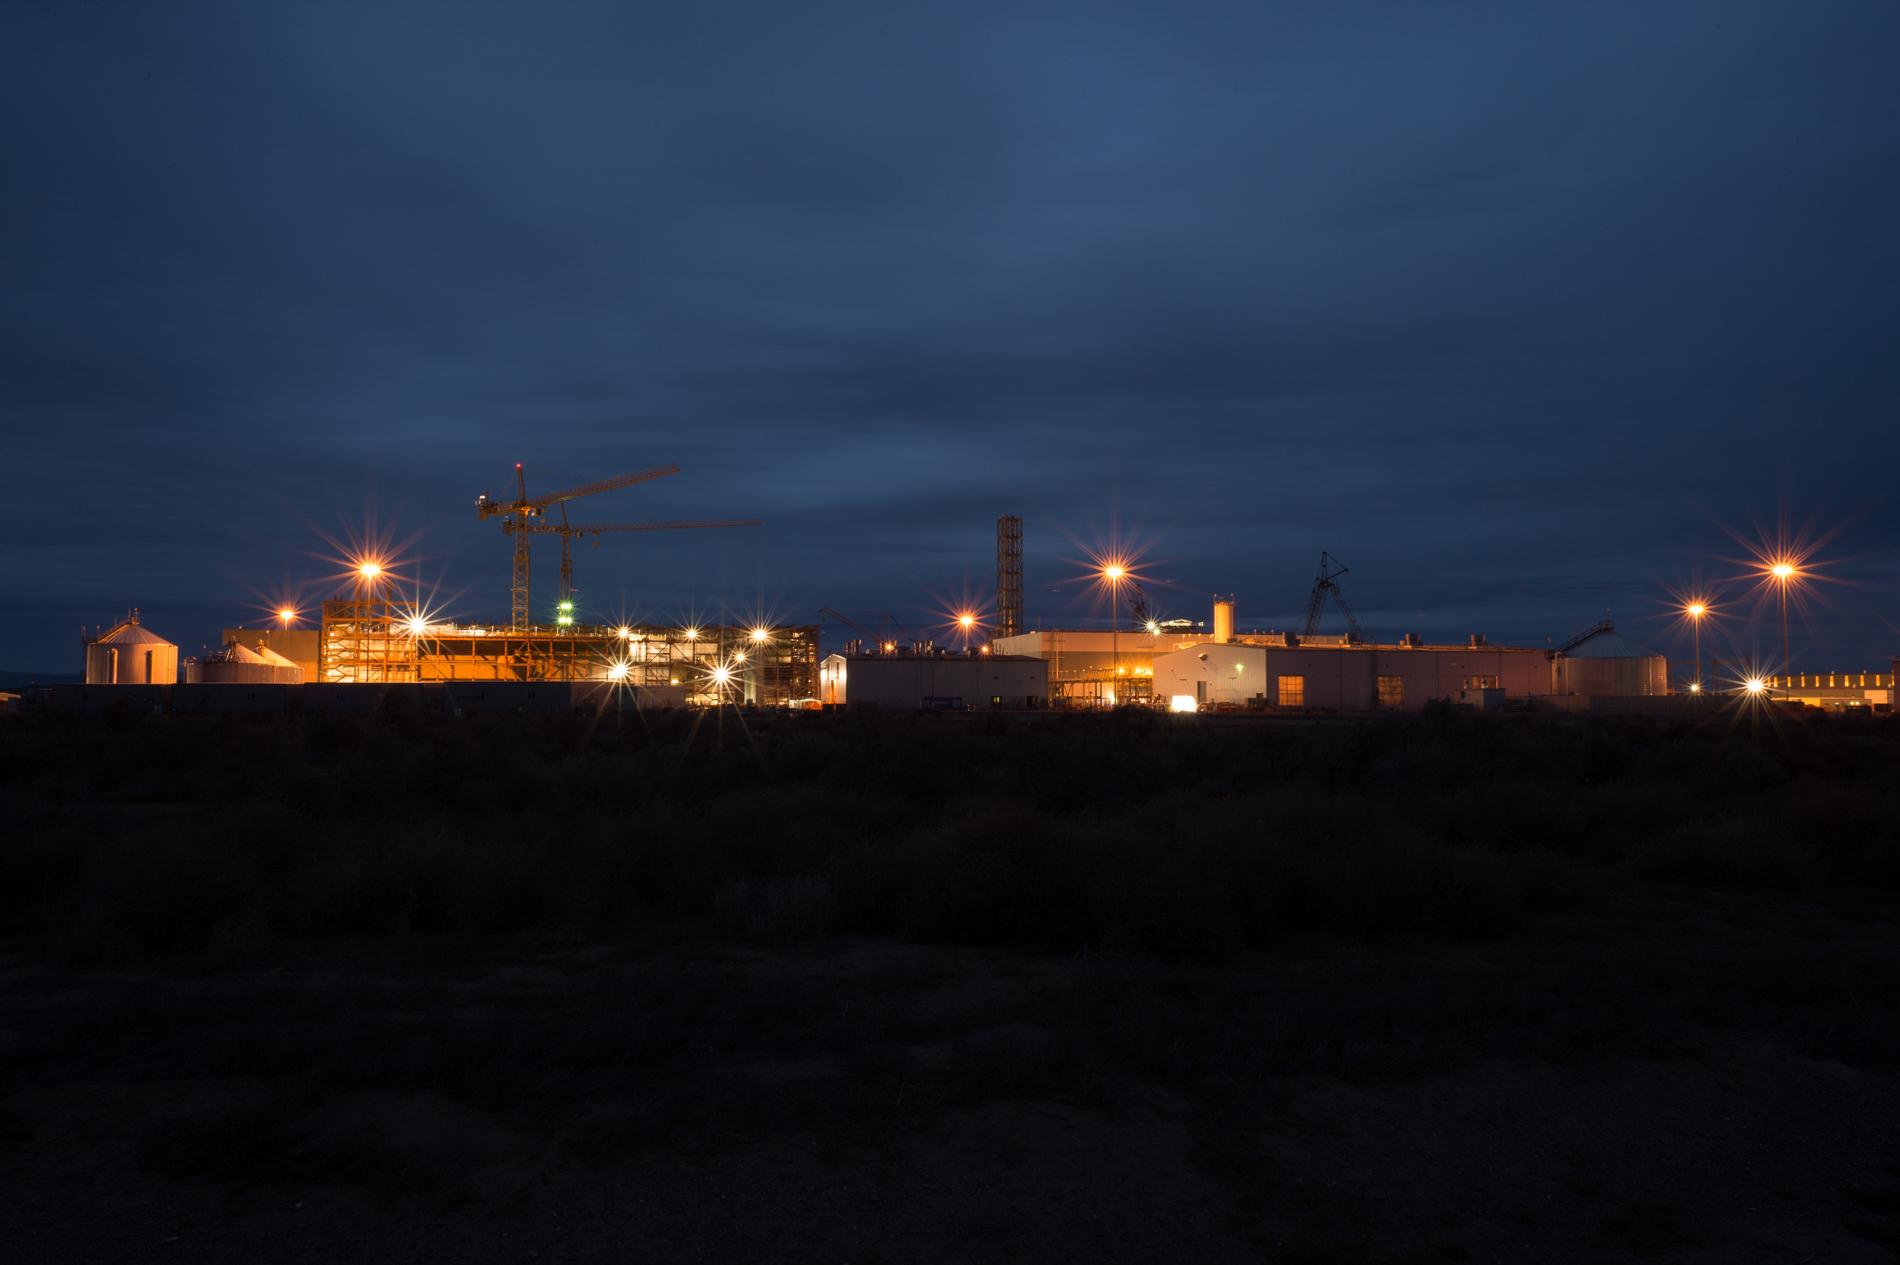 Lights on at the Vit Plant